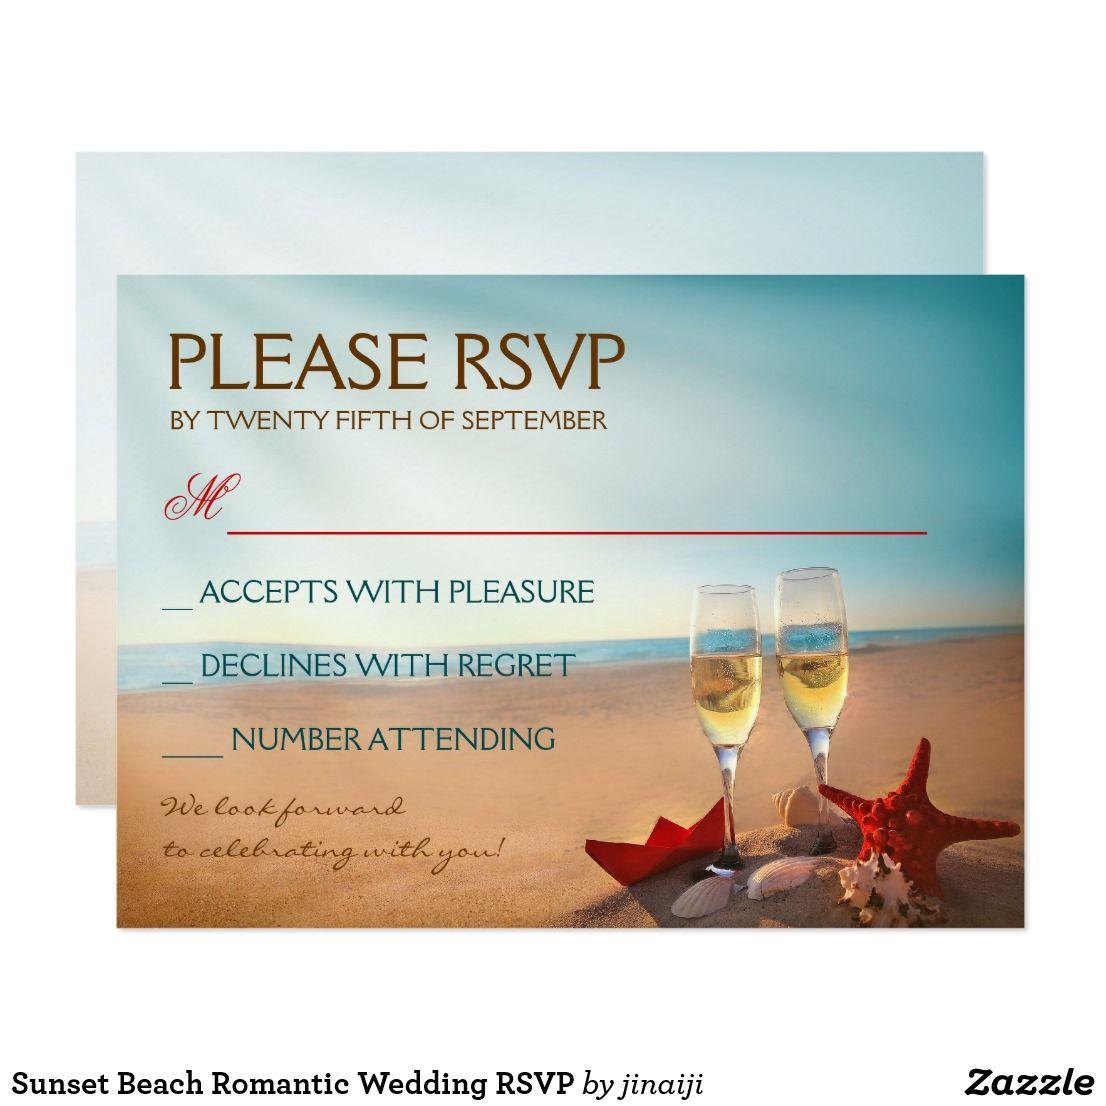 Sunset Beach Wedding Ideas: Sunset Beach Romantic Wedding RSVP